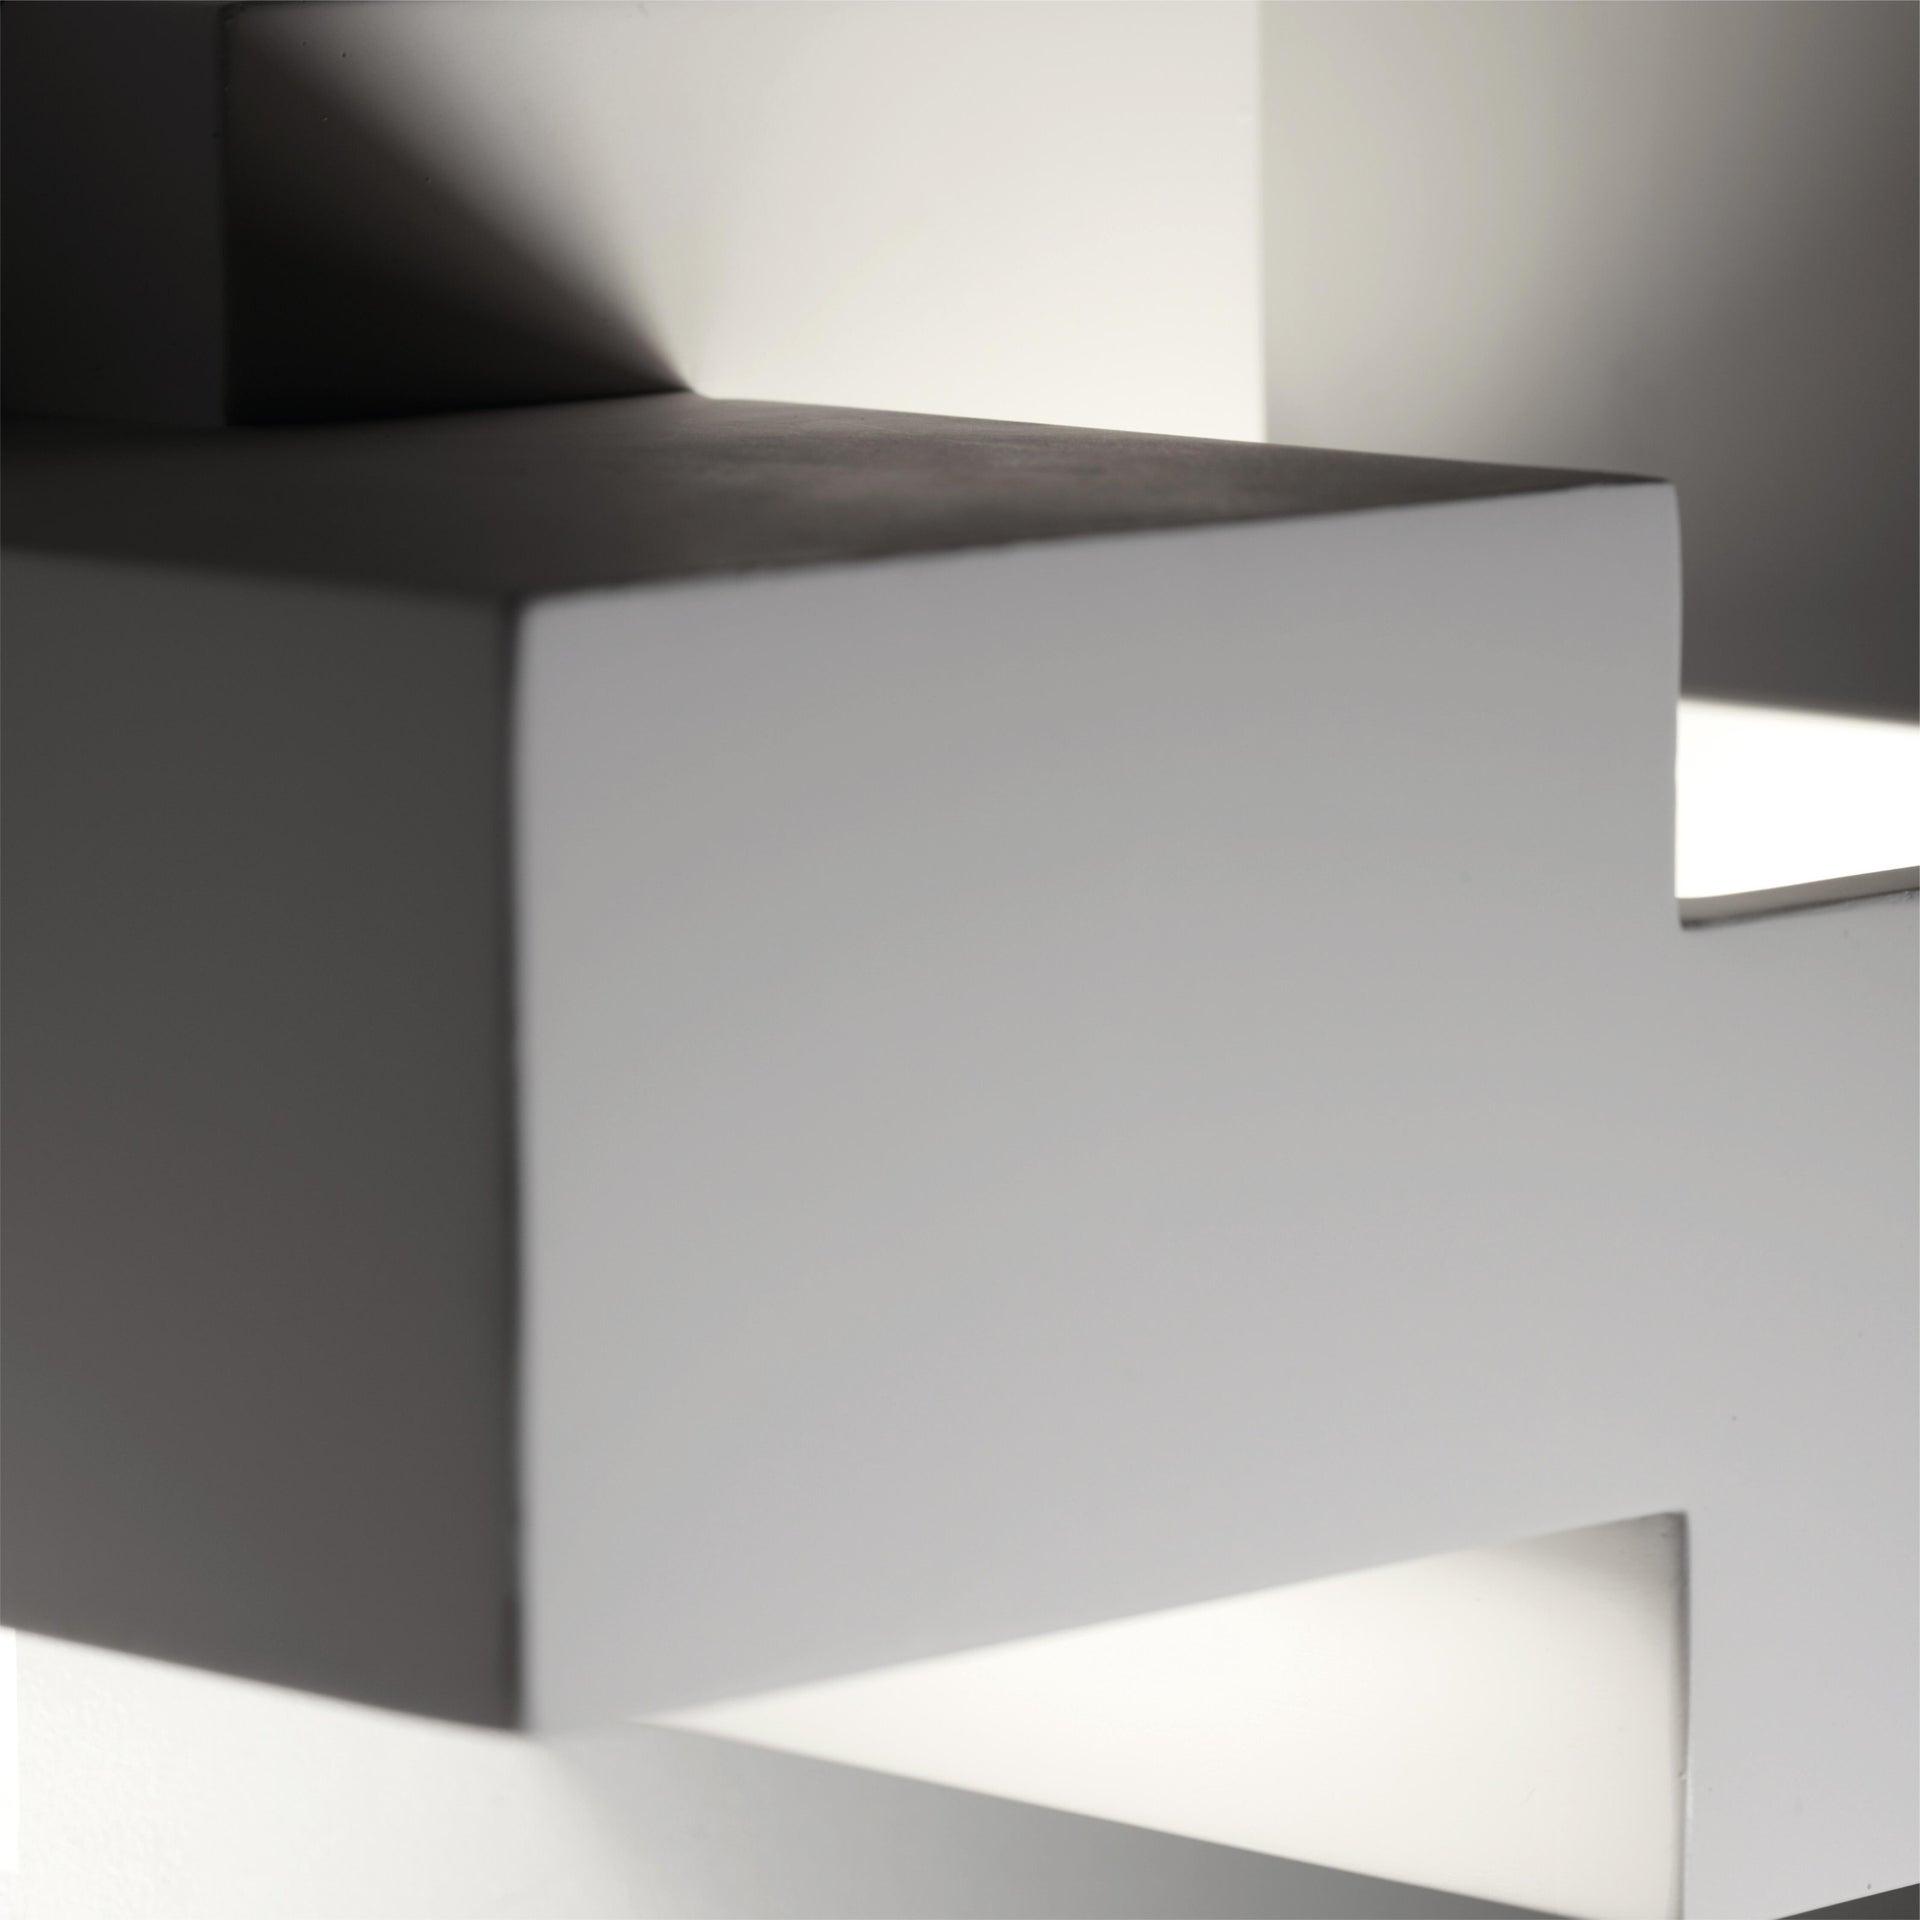 Applique SIDE SMALL bianco, in gesso, 2 luci - 5